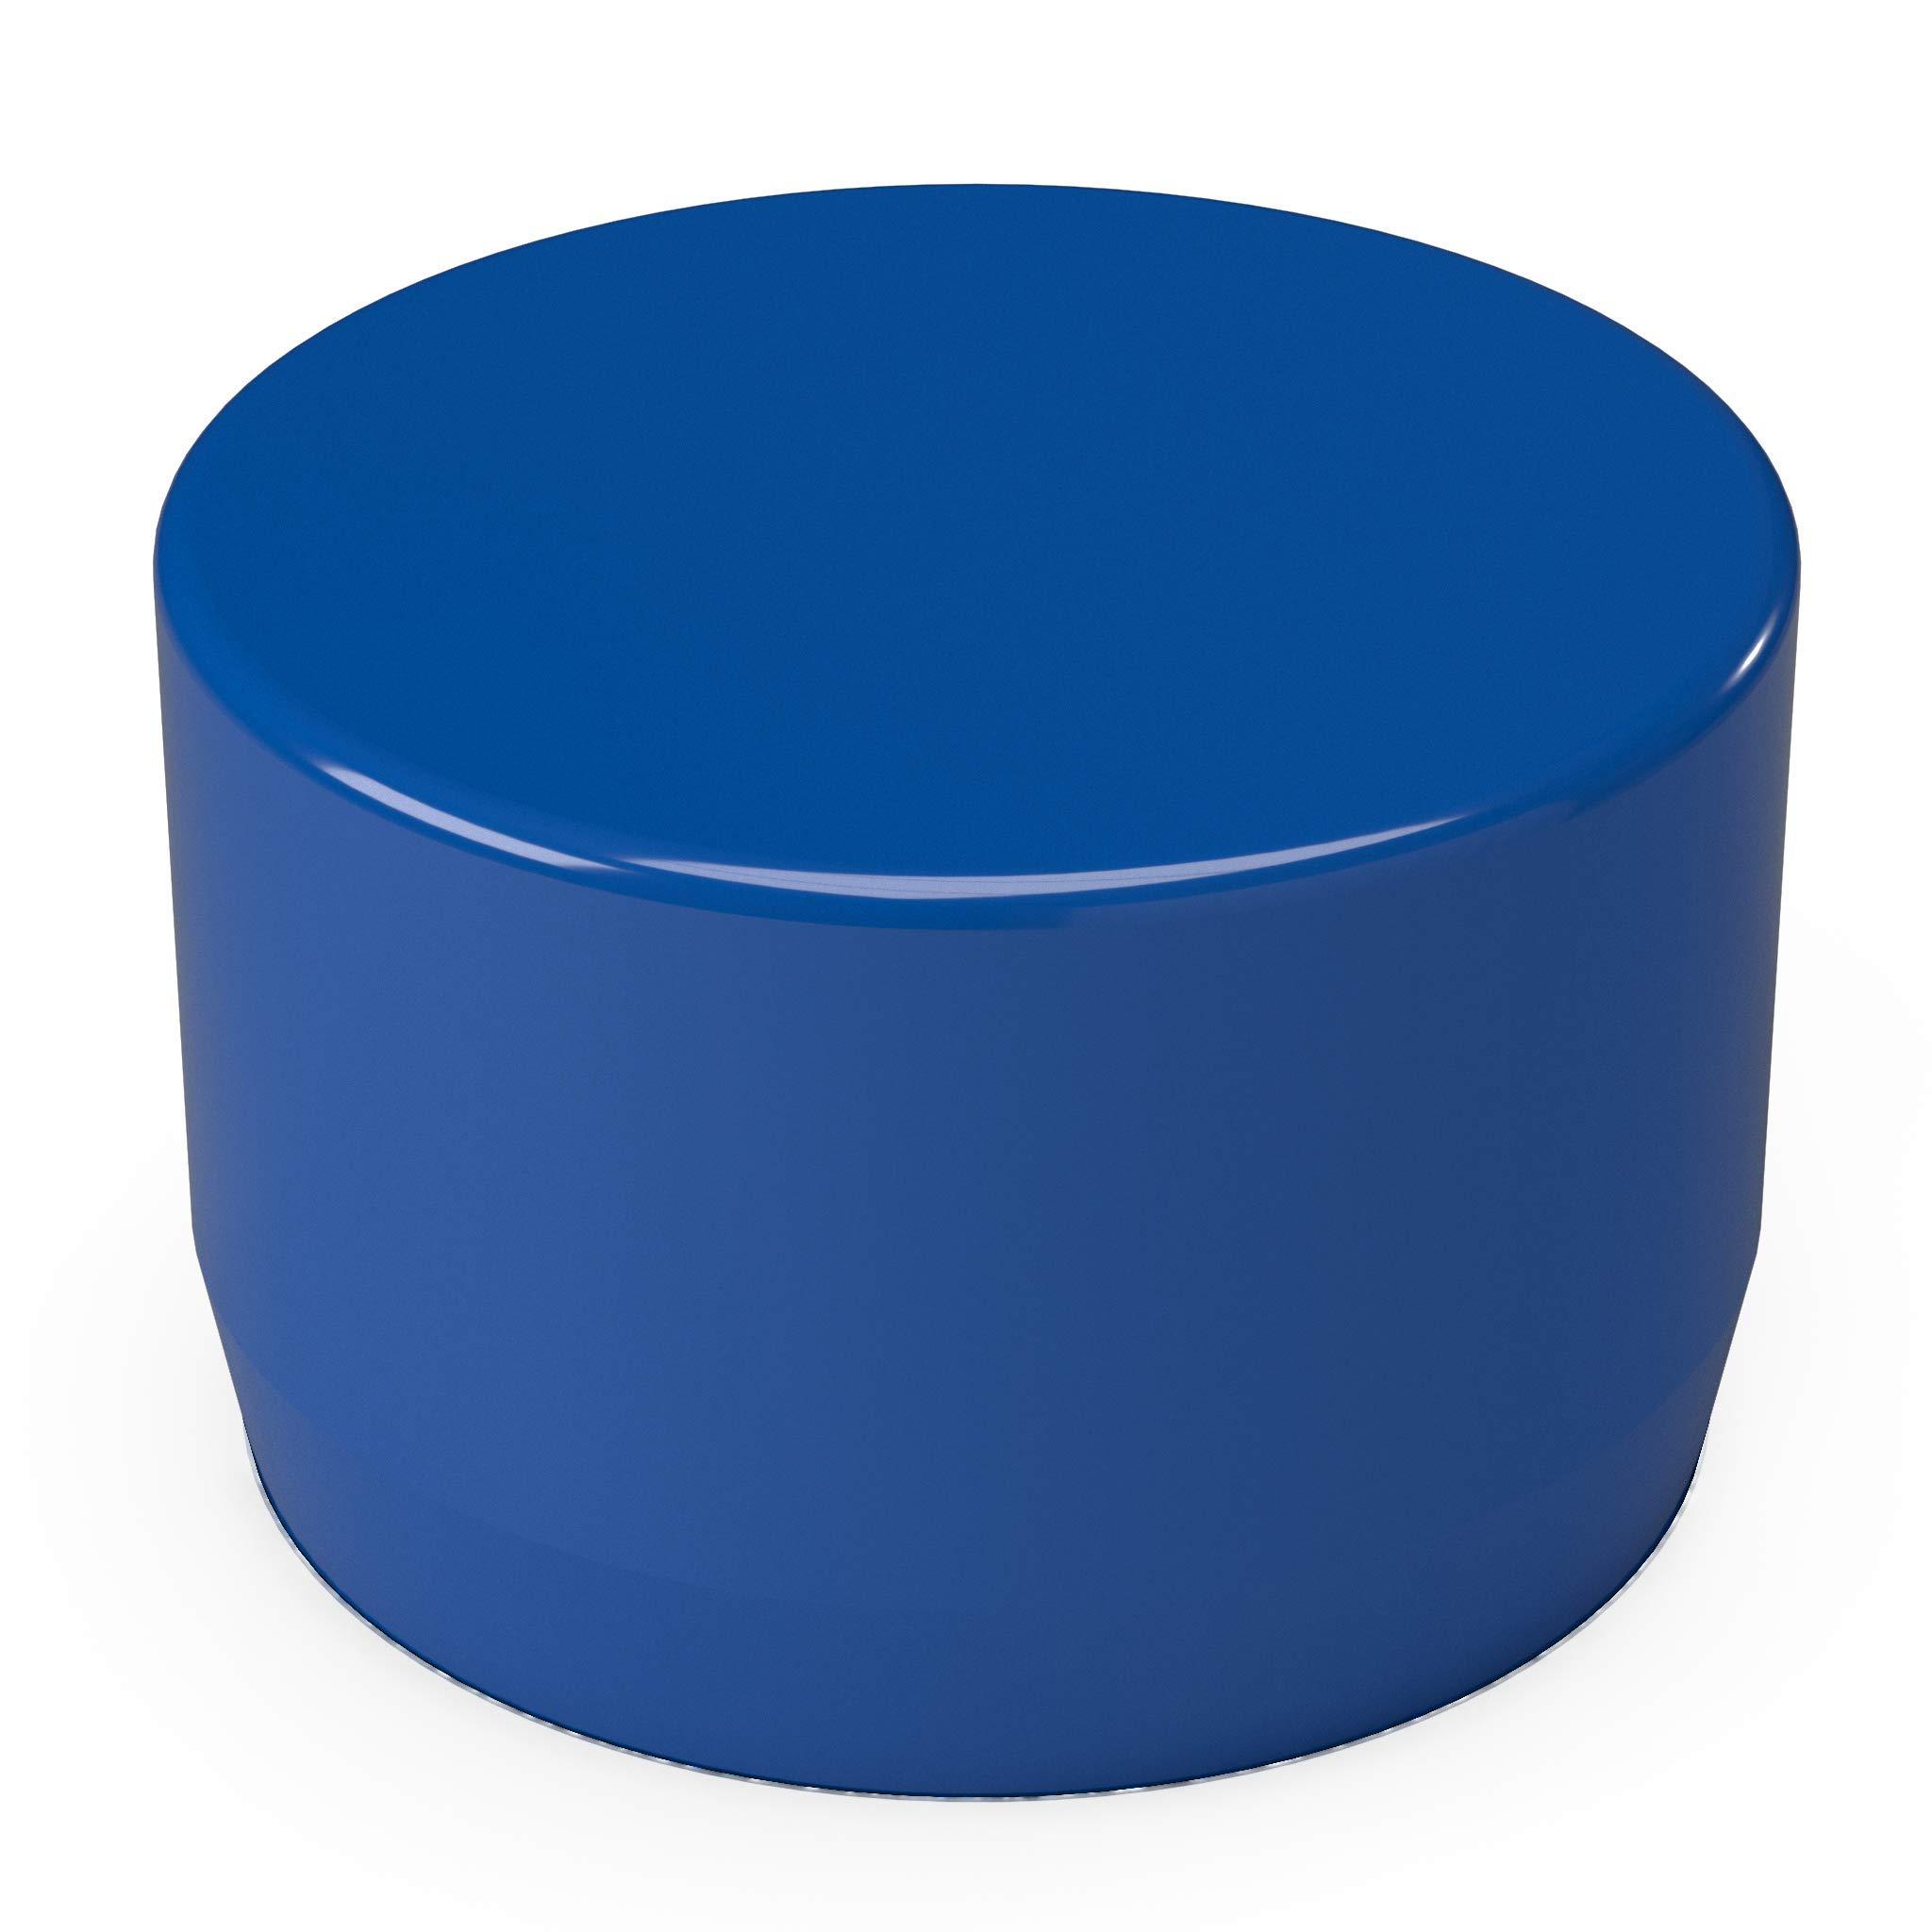 FORMUFIT F114EEC-BL-10 PVC External End Cap, Furniture Grade, 1-1/4'' Size, Blue (Pack of 10)